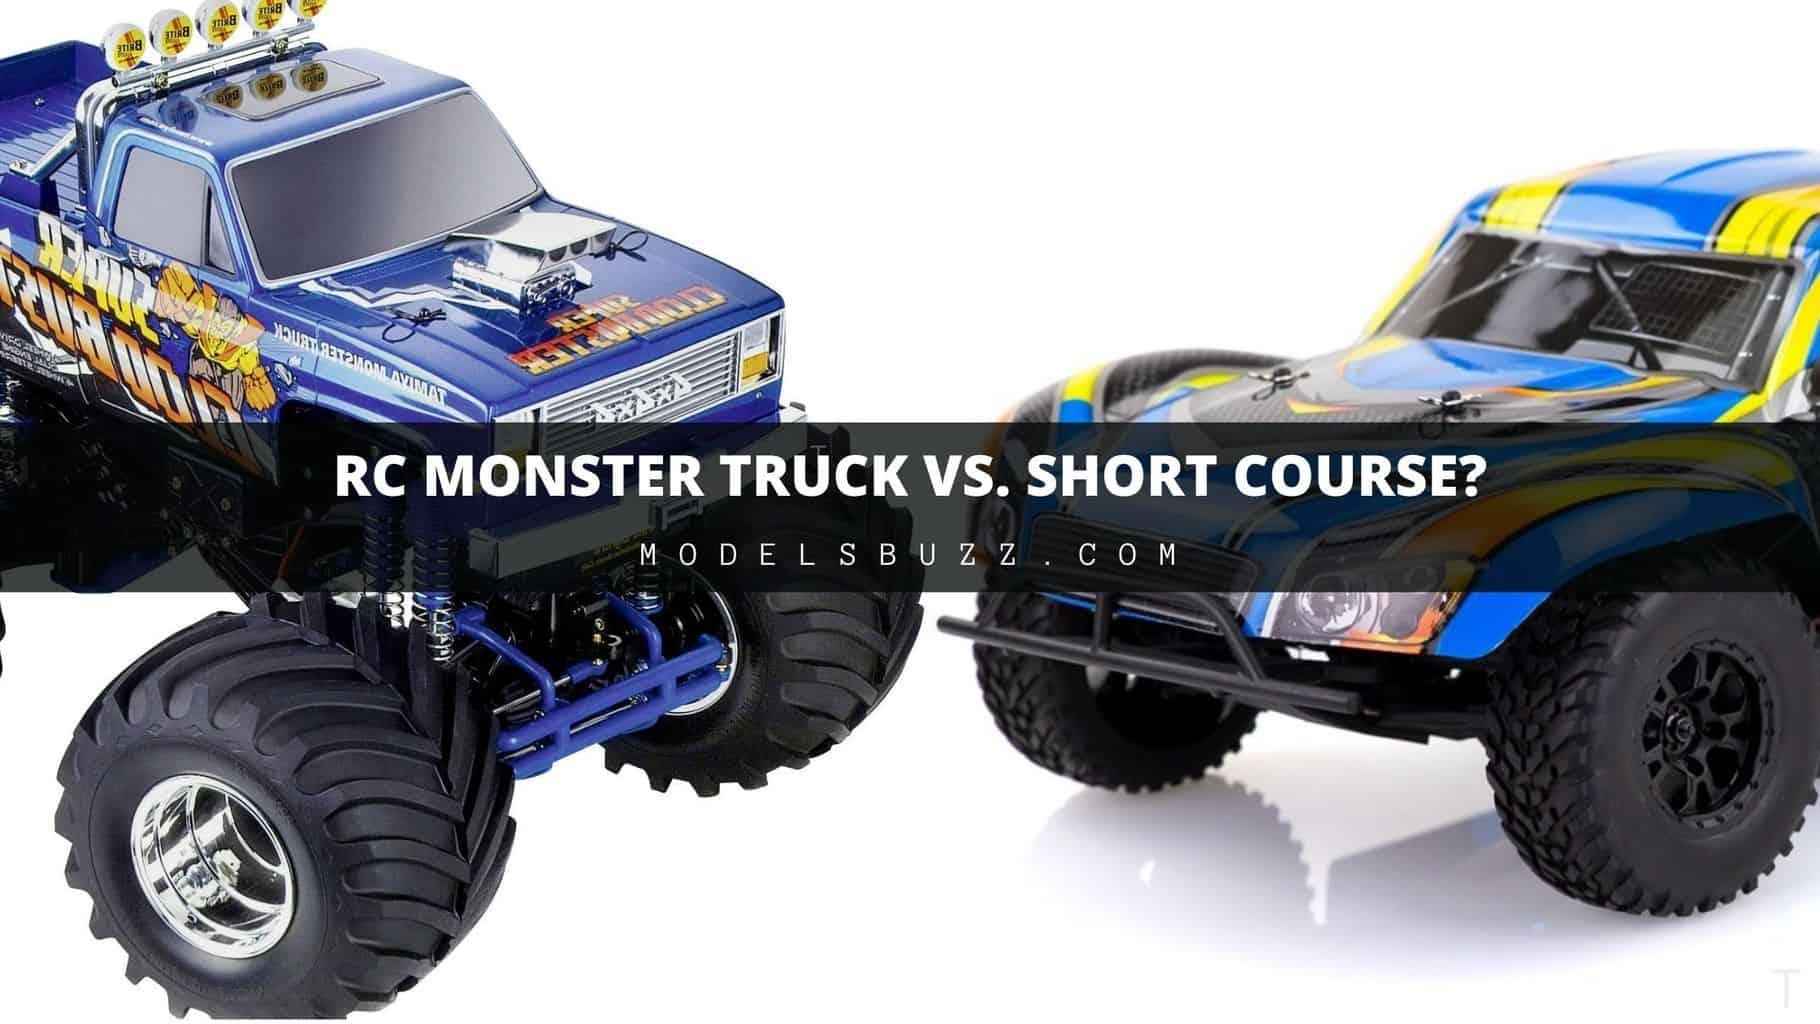 RC Monster Truck vs. Short Course car